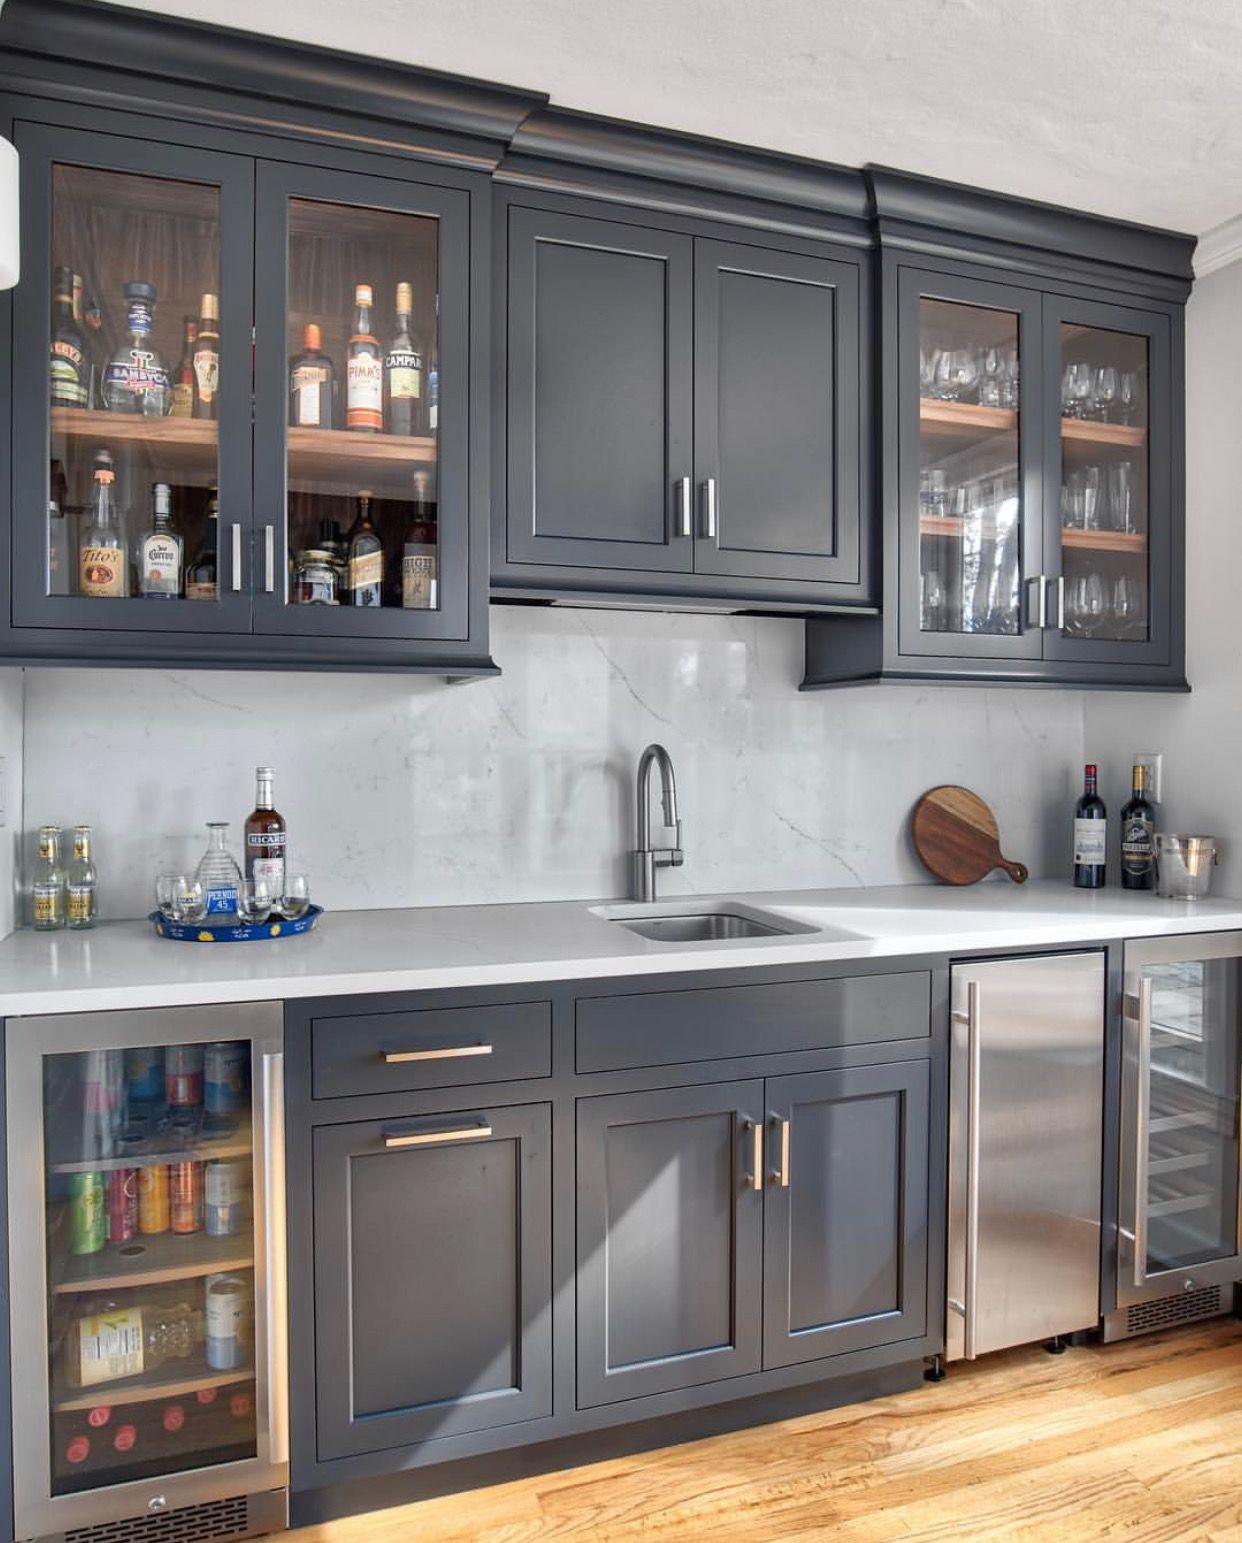 Butler S Pantry Or Basement Kitchen Kitchen Remodel Small Kitchen Renovation Basement Kitchen